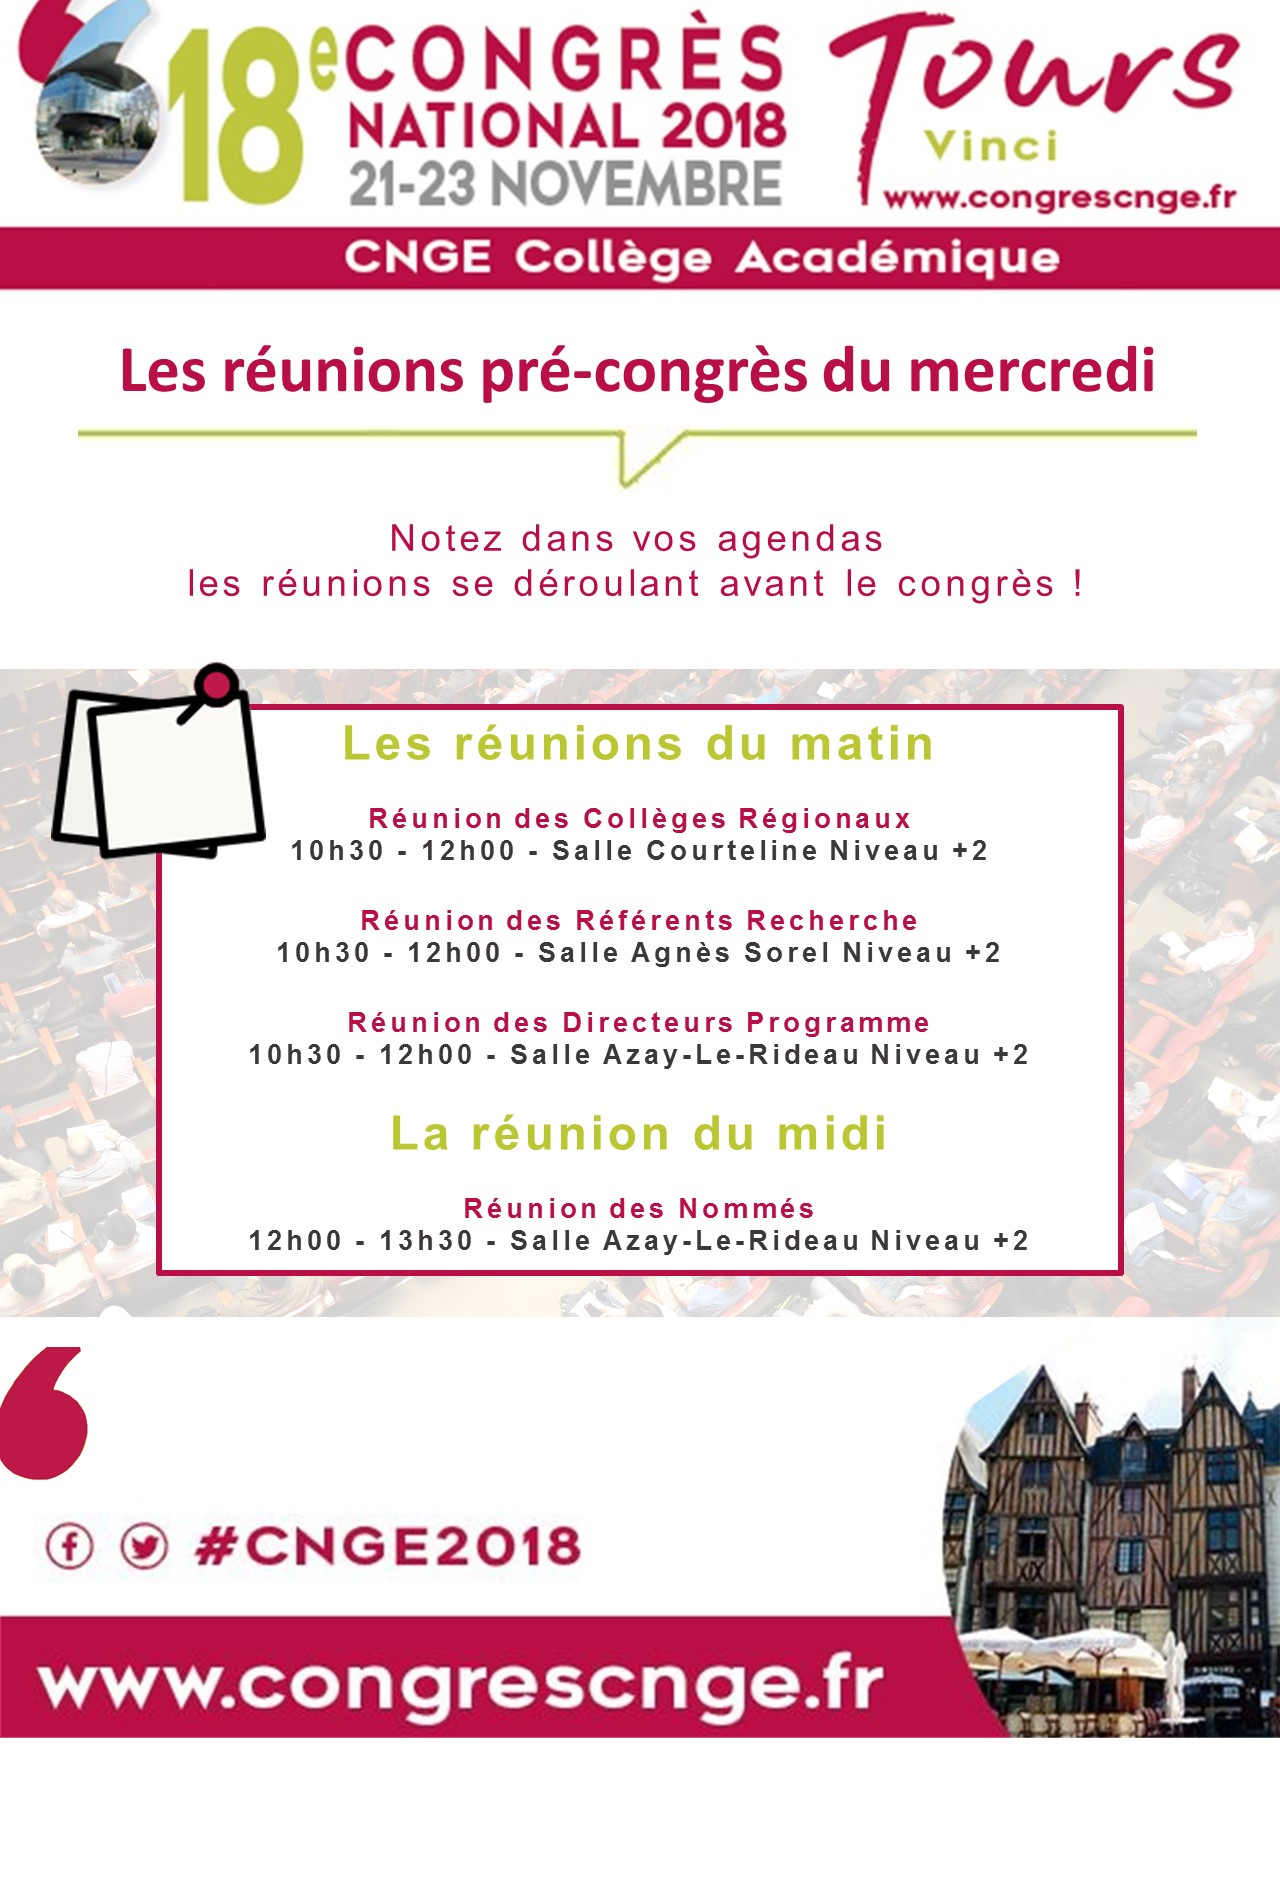 CNGE18_reunions precongres